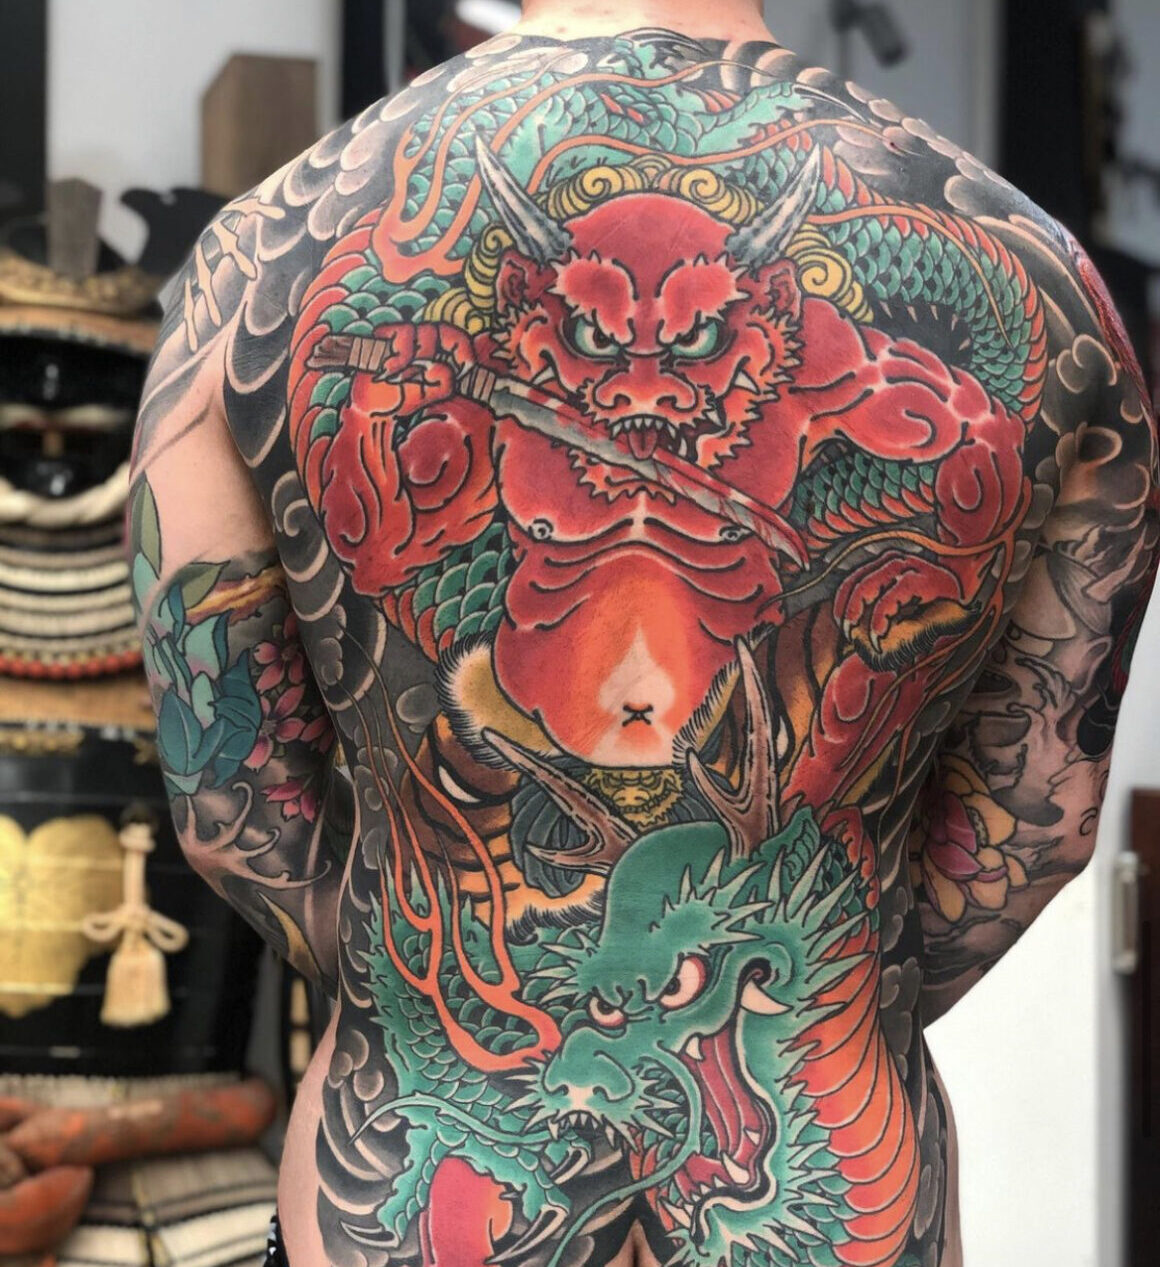 Alex Rusty, Lighthouse Tattoo, Sydney, Australia